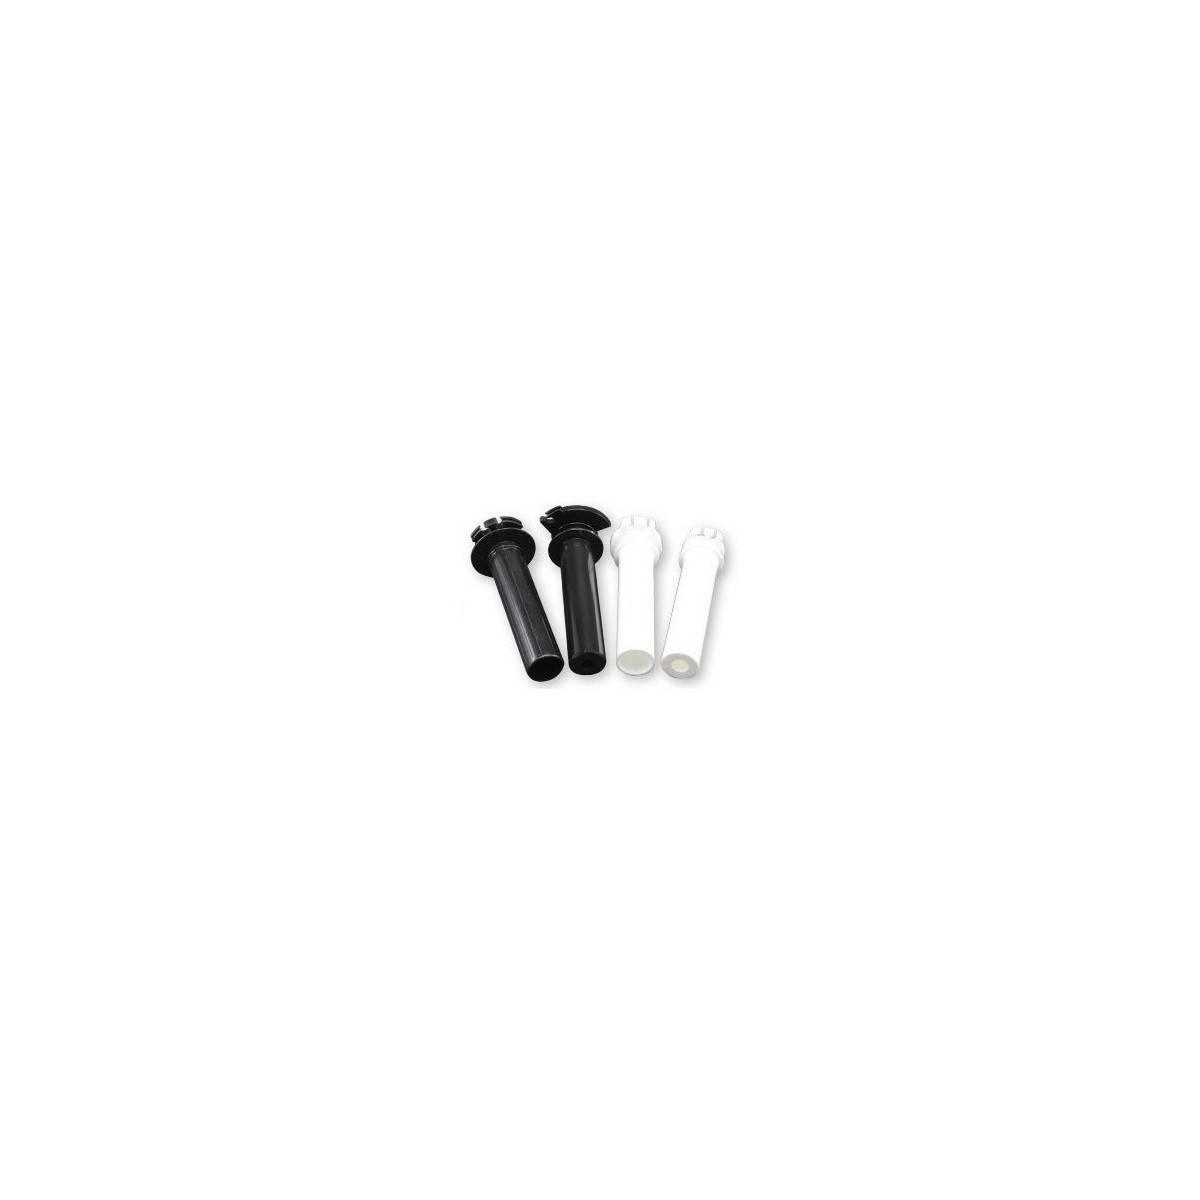 ZE45.8014 - Caña Gas Plastico Yzf25012 17 Yzf450 14 15 Rmz 250 07 17